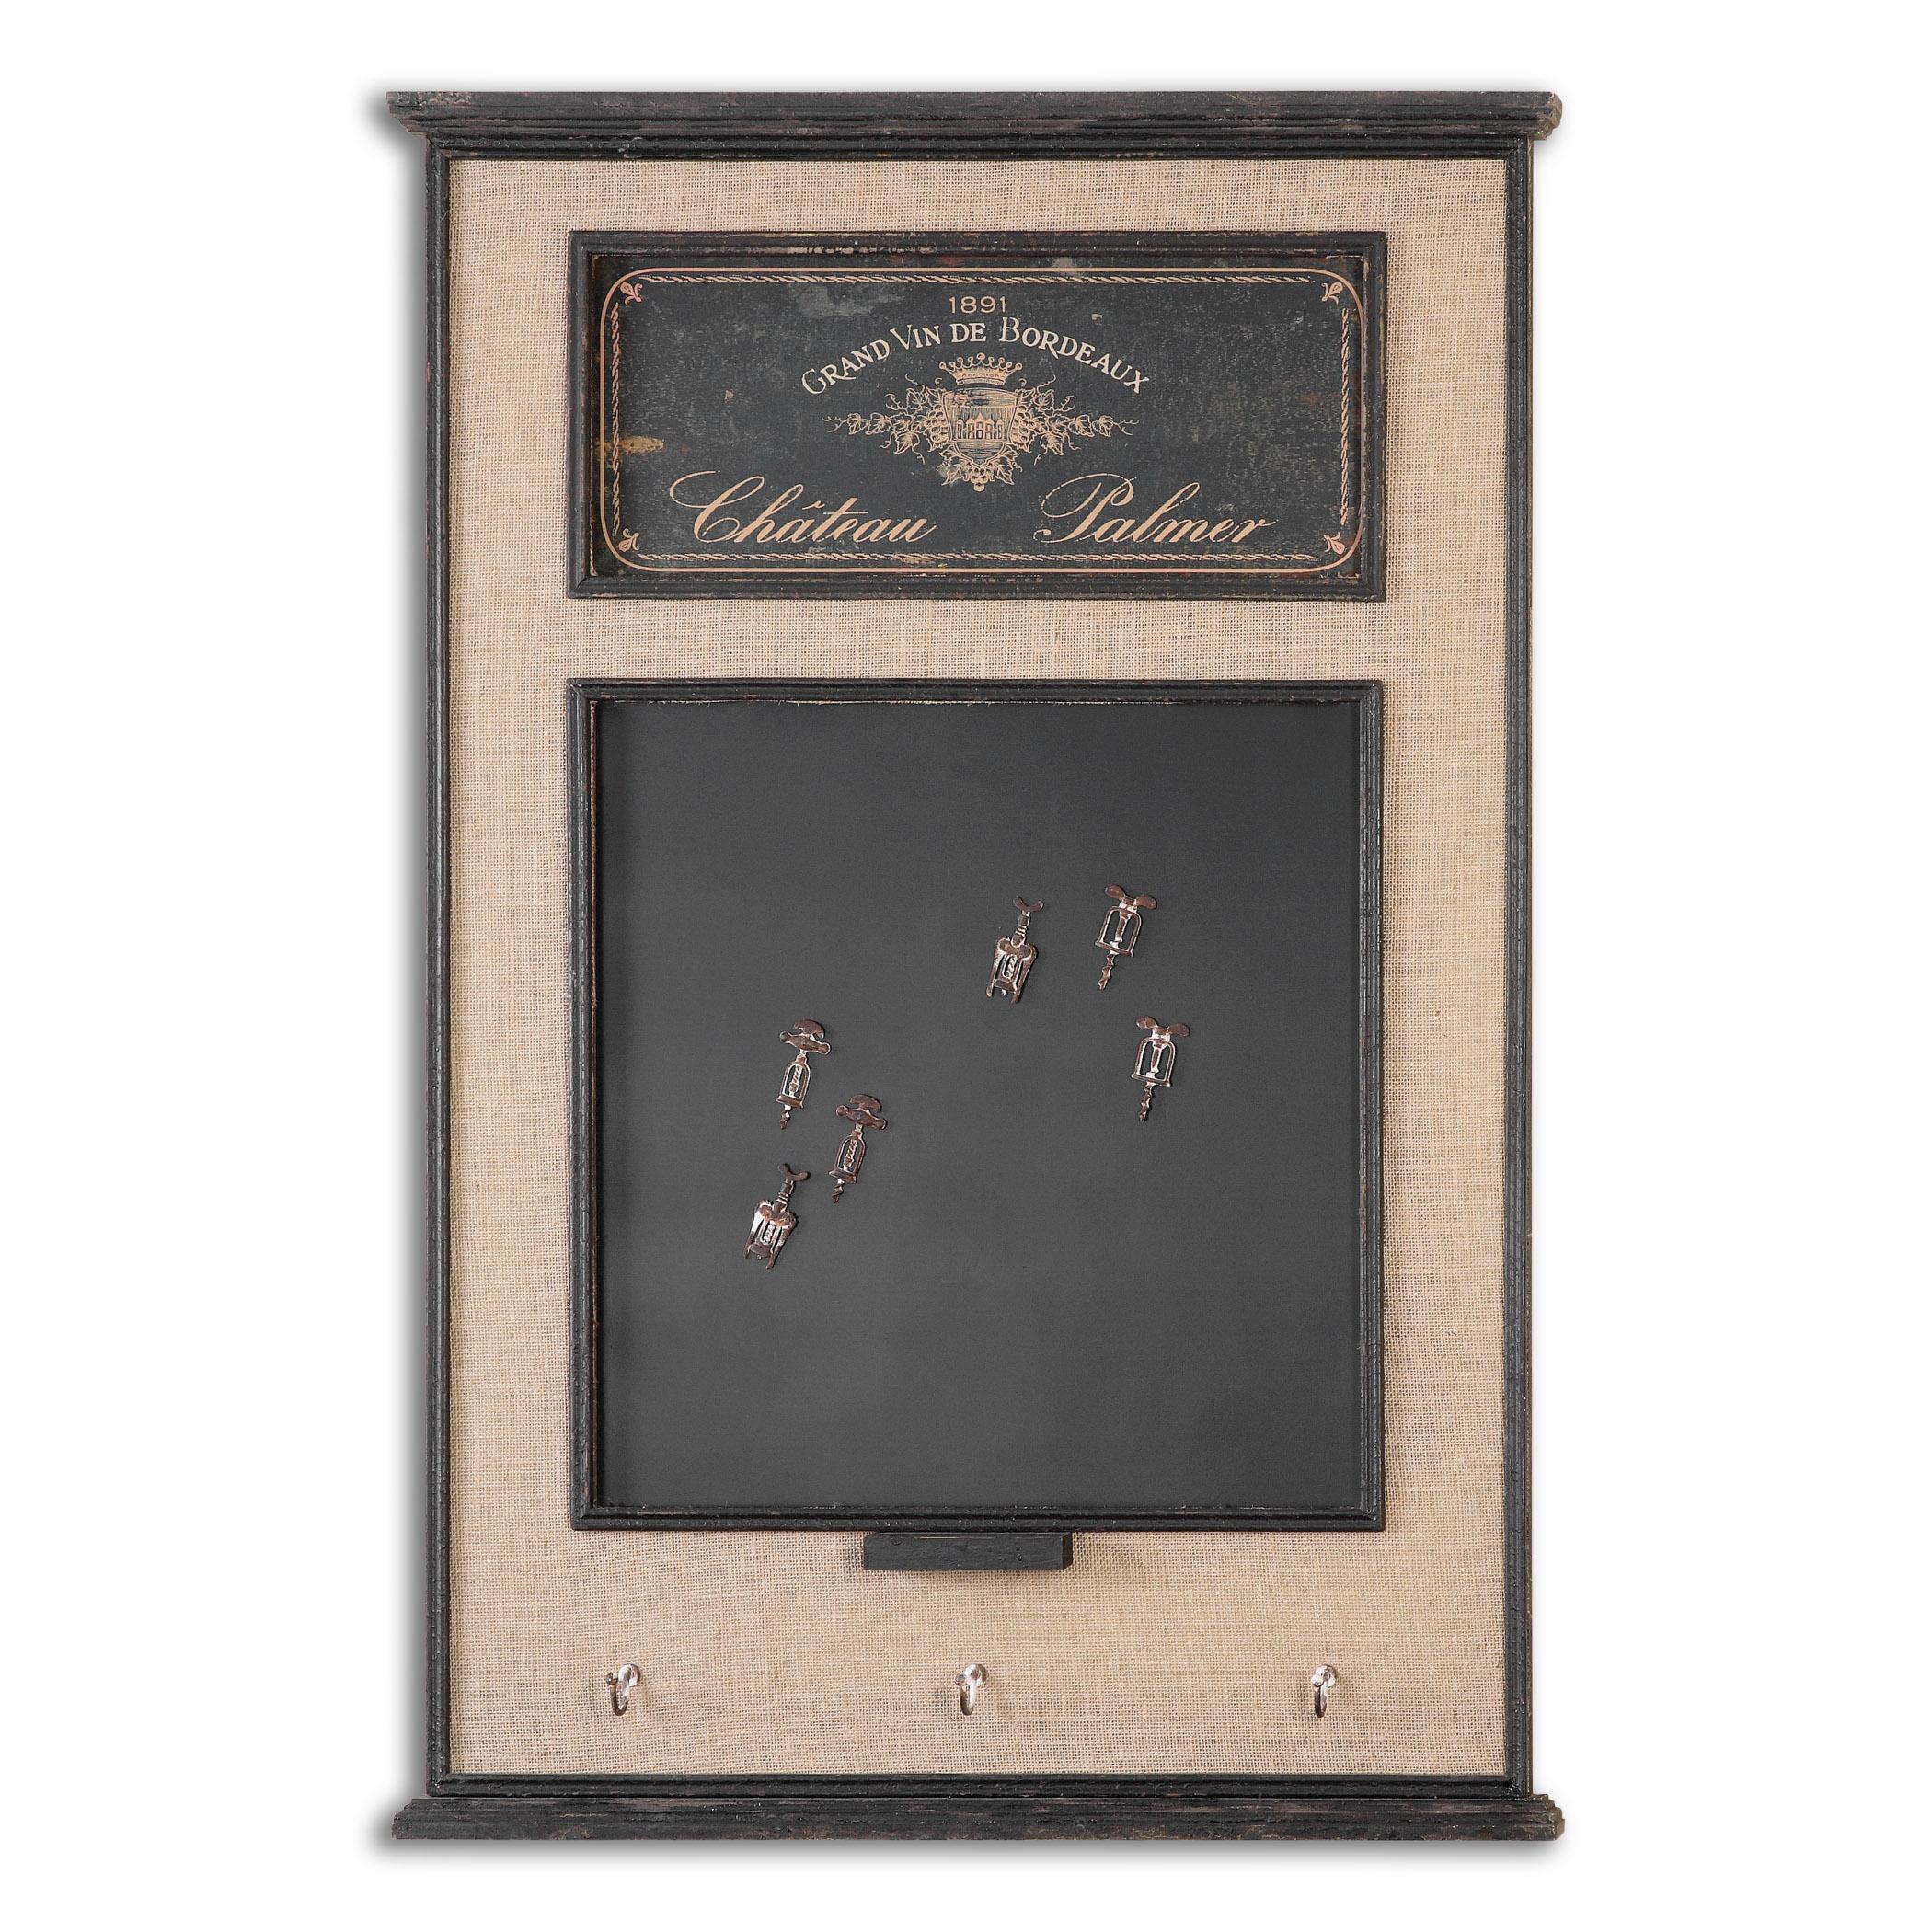 Uttermost Art Chateau Palmer Chalkboard - Item Number: 10510